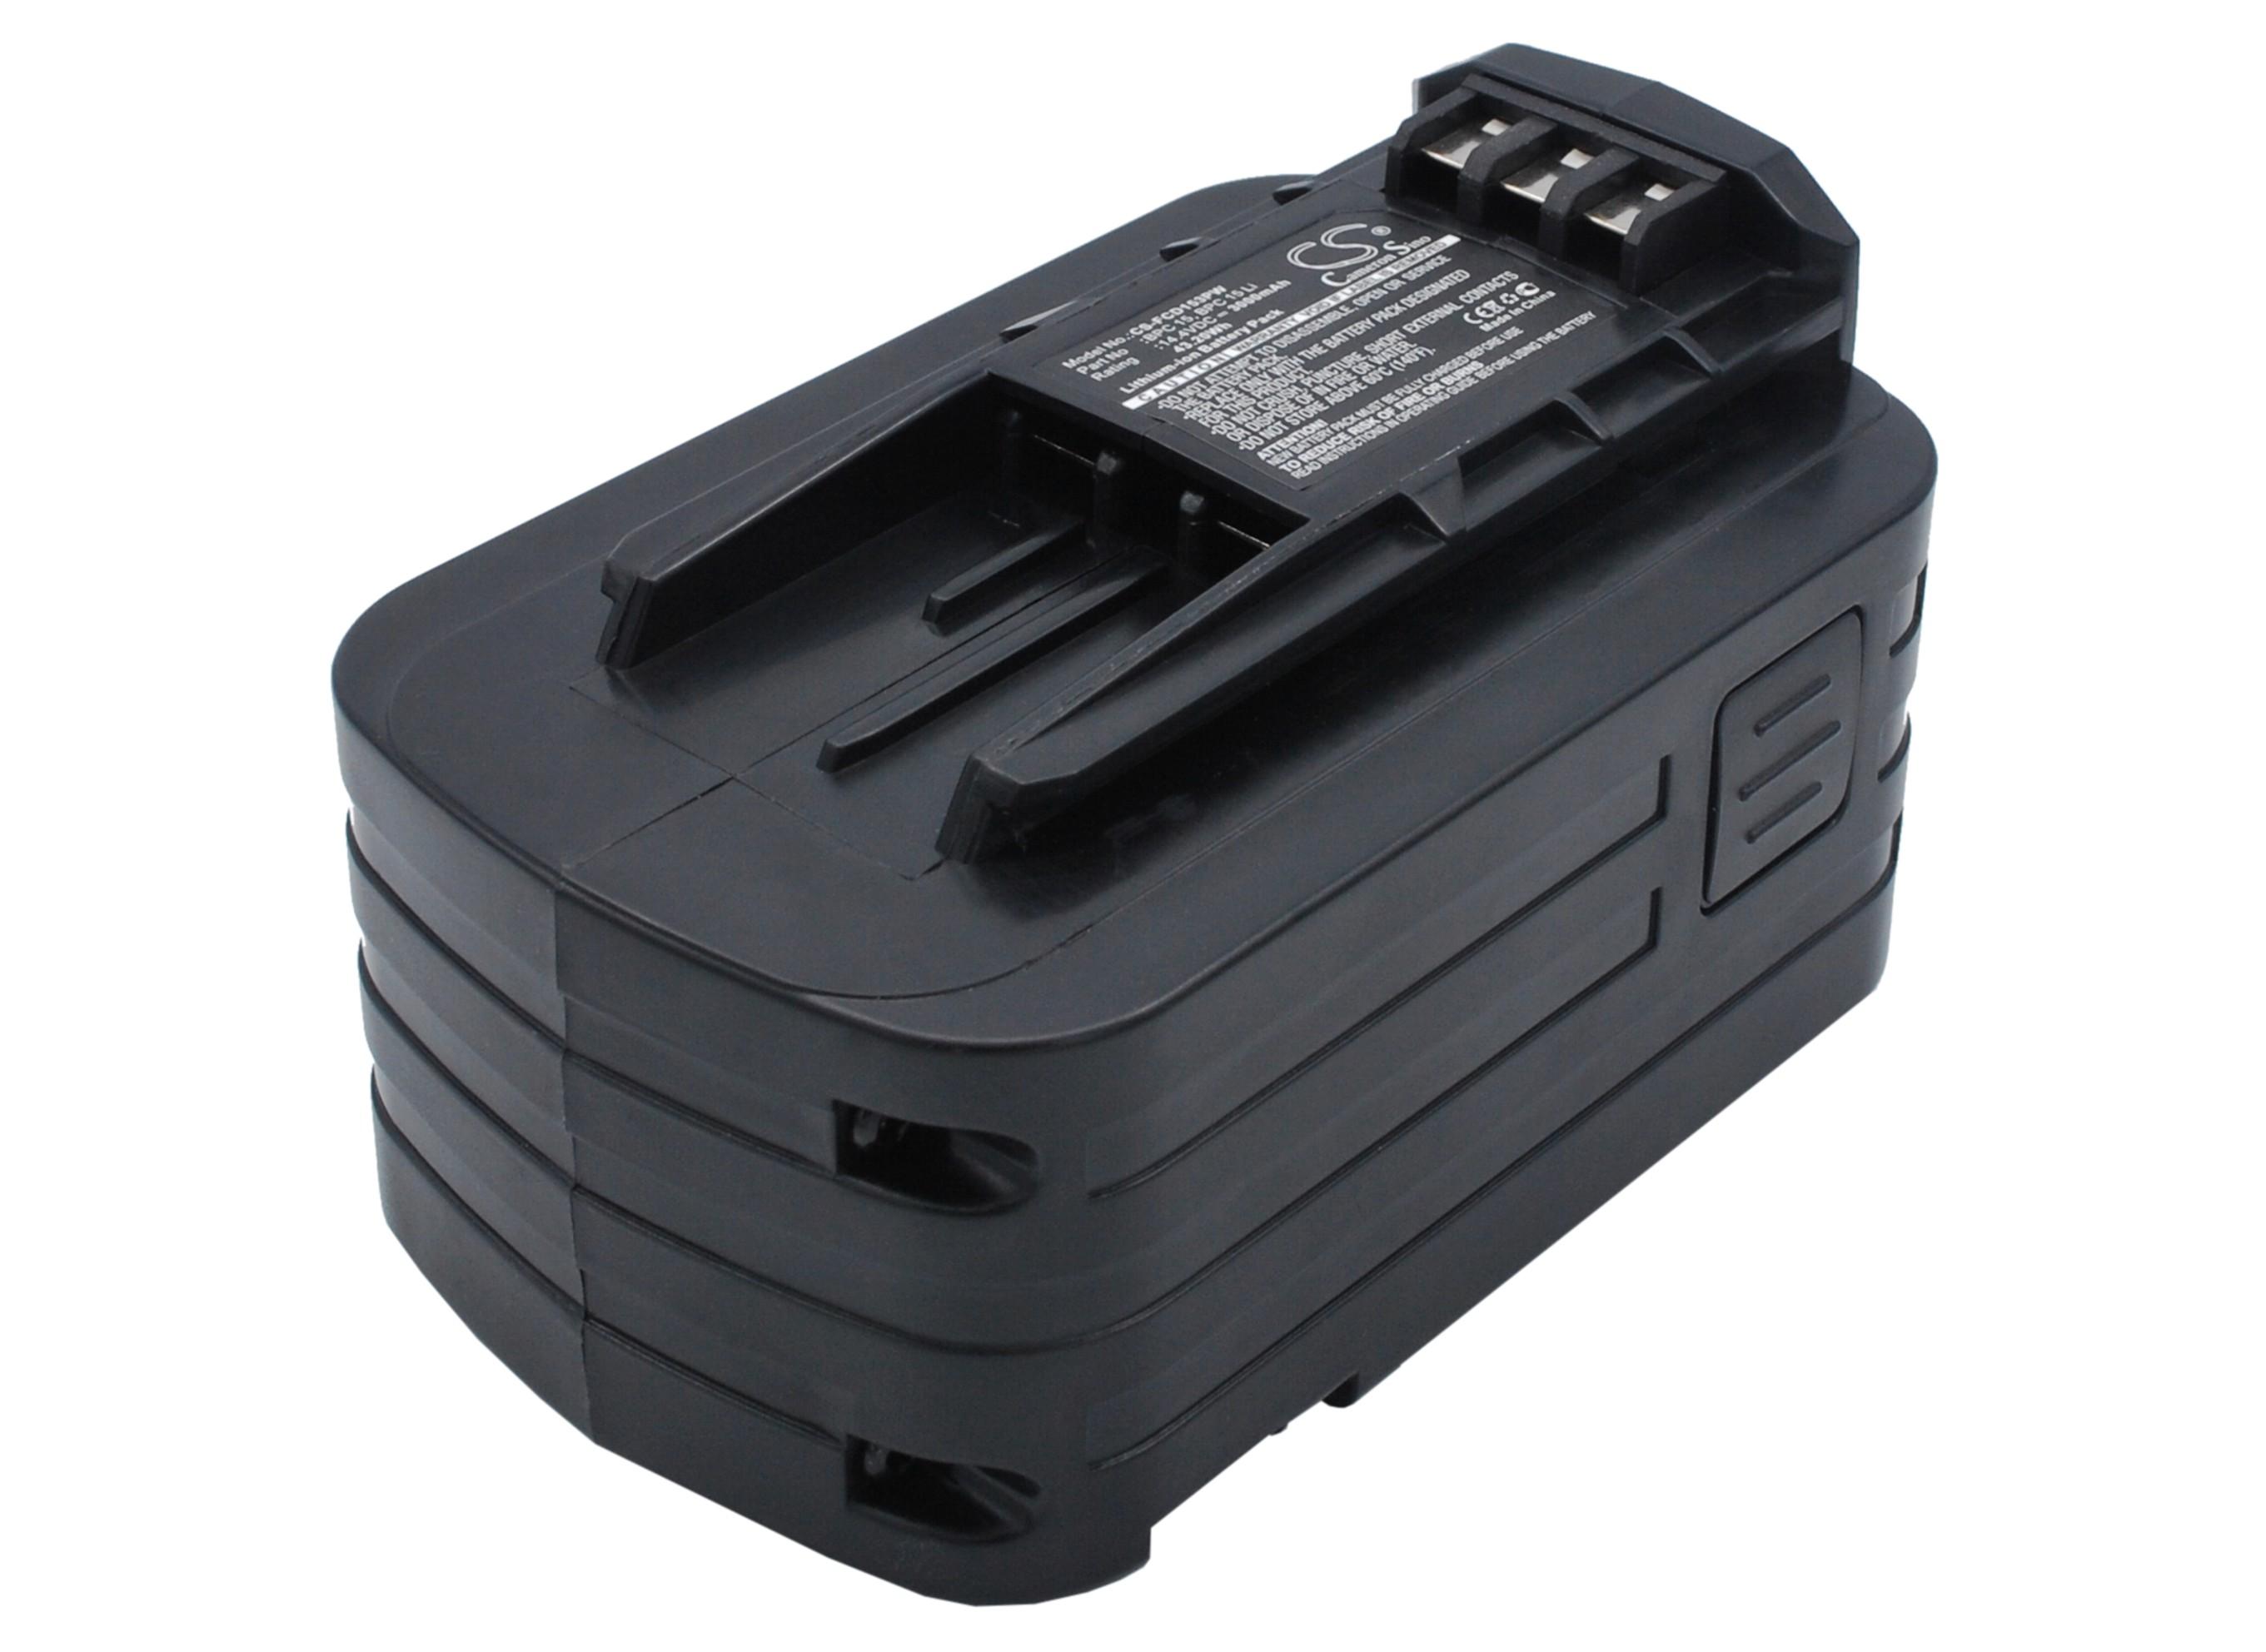 Cameron Sino baterie do nářadí pro FESTOOL T15 Cordless Drill/Driver 14.4V Li-ion 3000mAh černá - neoriginální